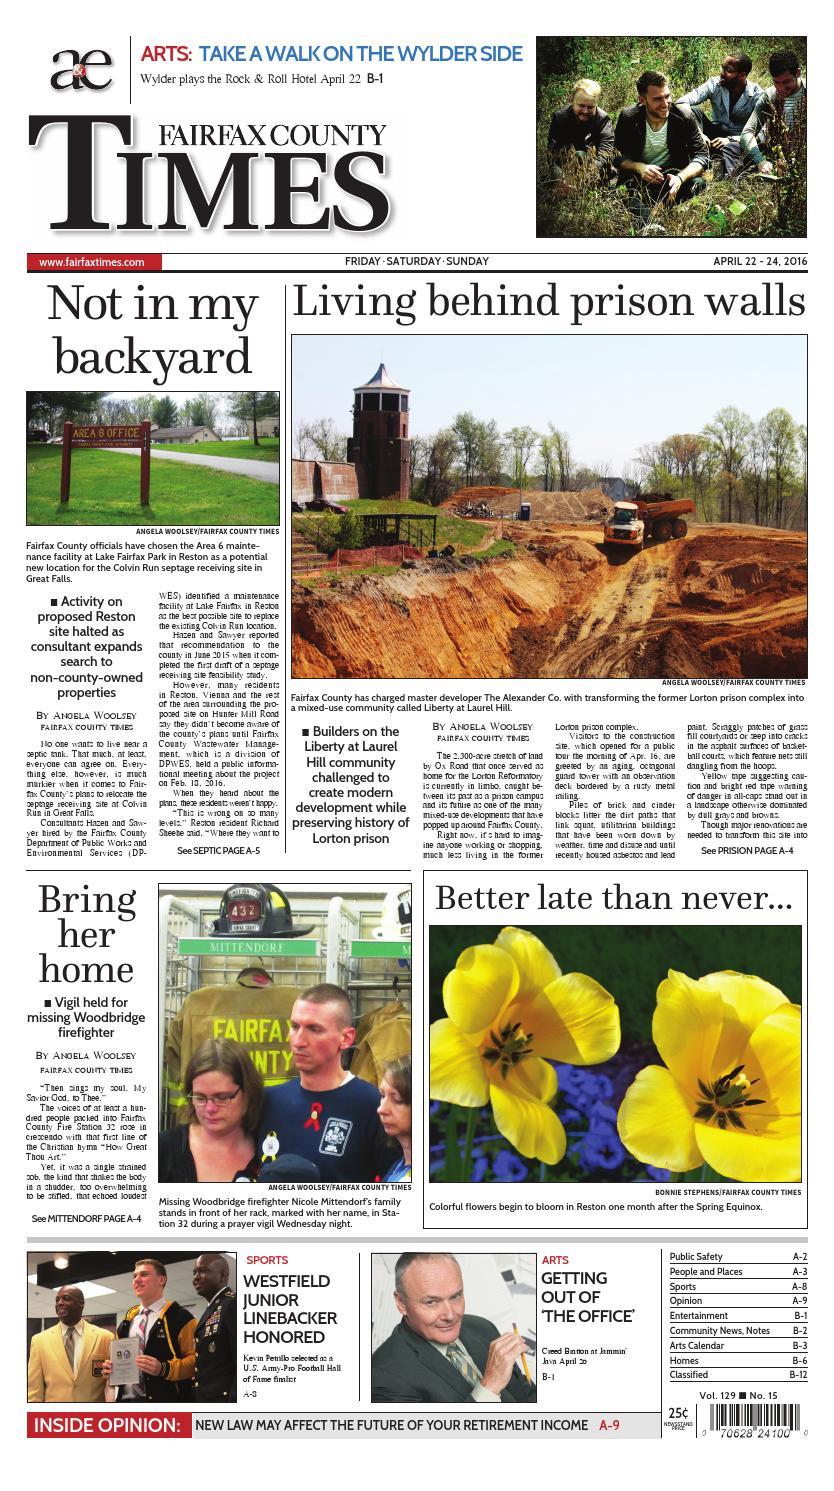 Fairfax County Times 04/22/16 by The Fairfax Times - Issuu